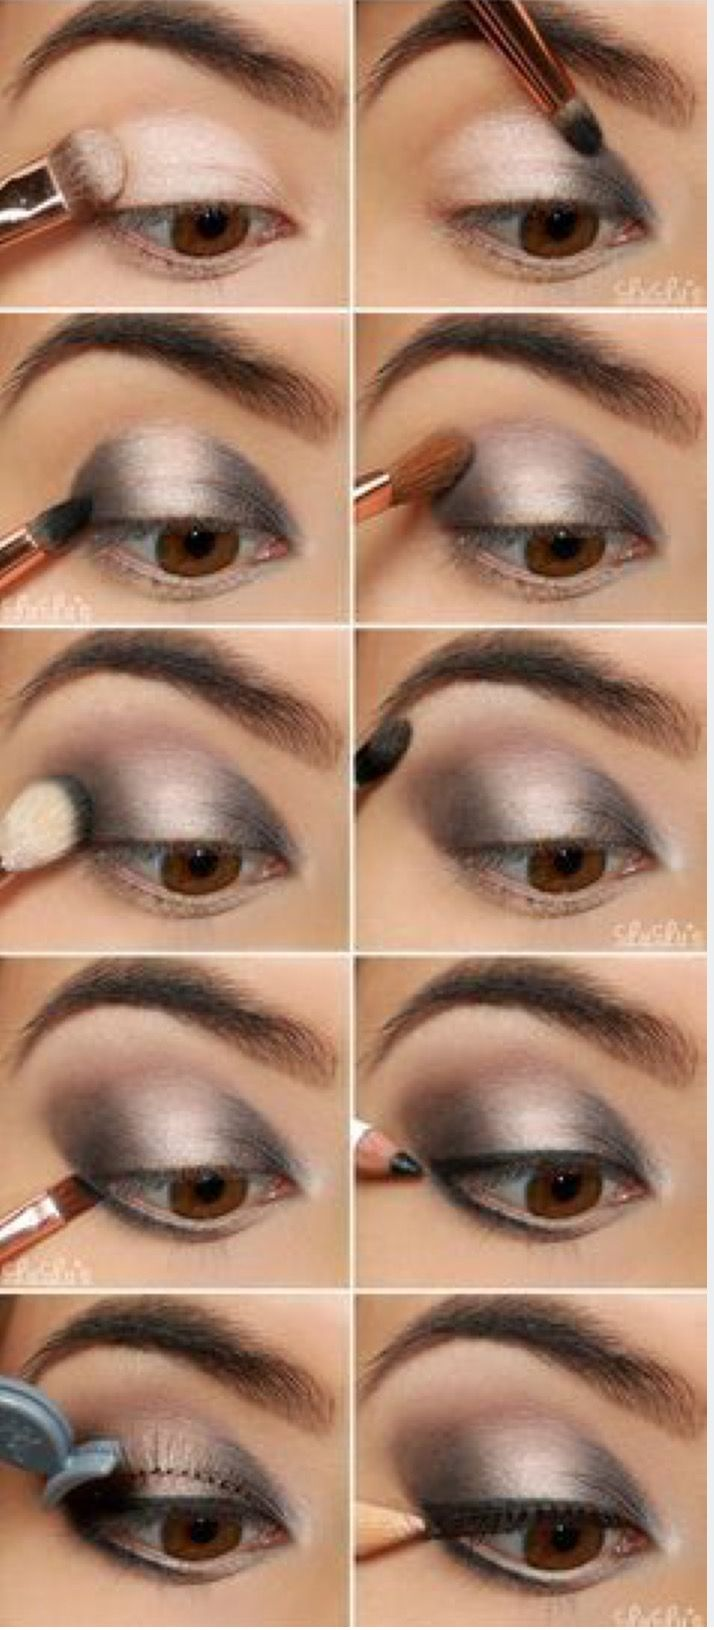 Pin By Lorena Del Rosario On Maquillaje Make Up Smokey Eyes